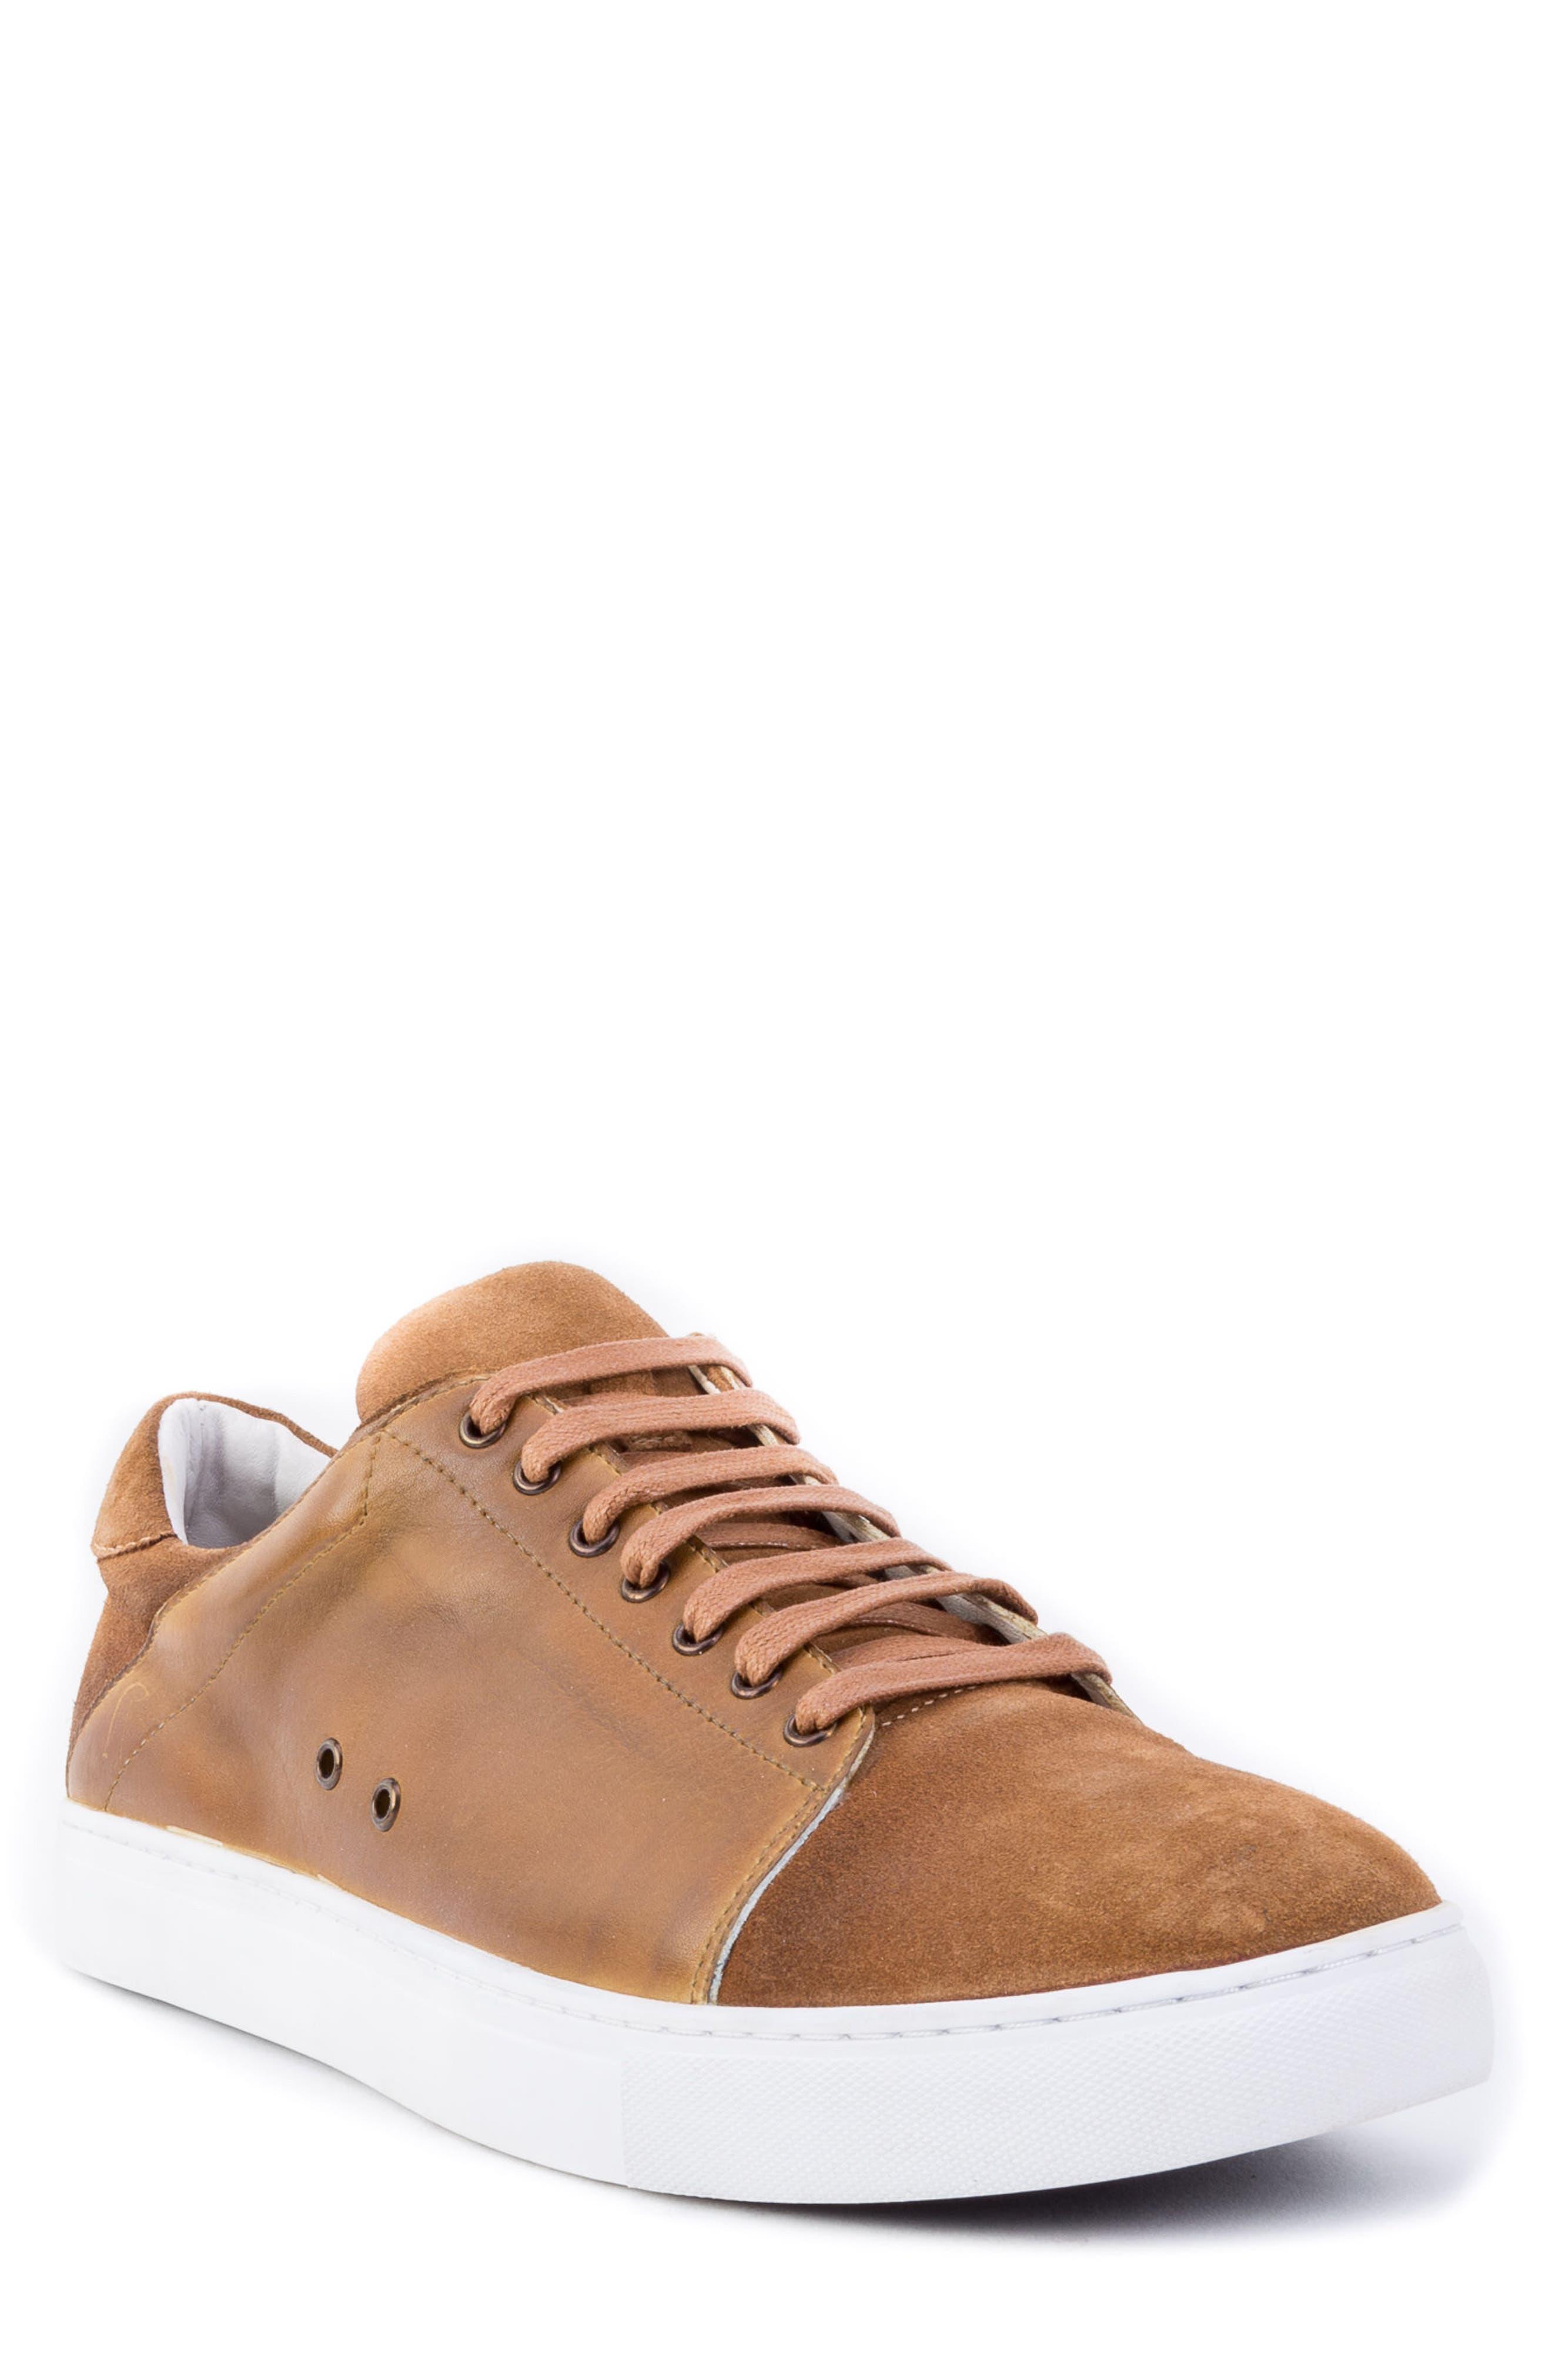 Zanzara Record Low Top Sneaker, Brown